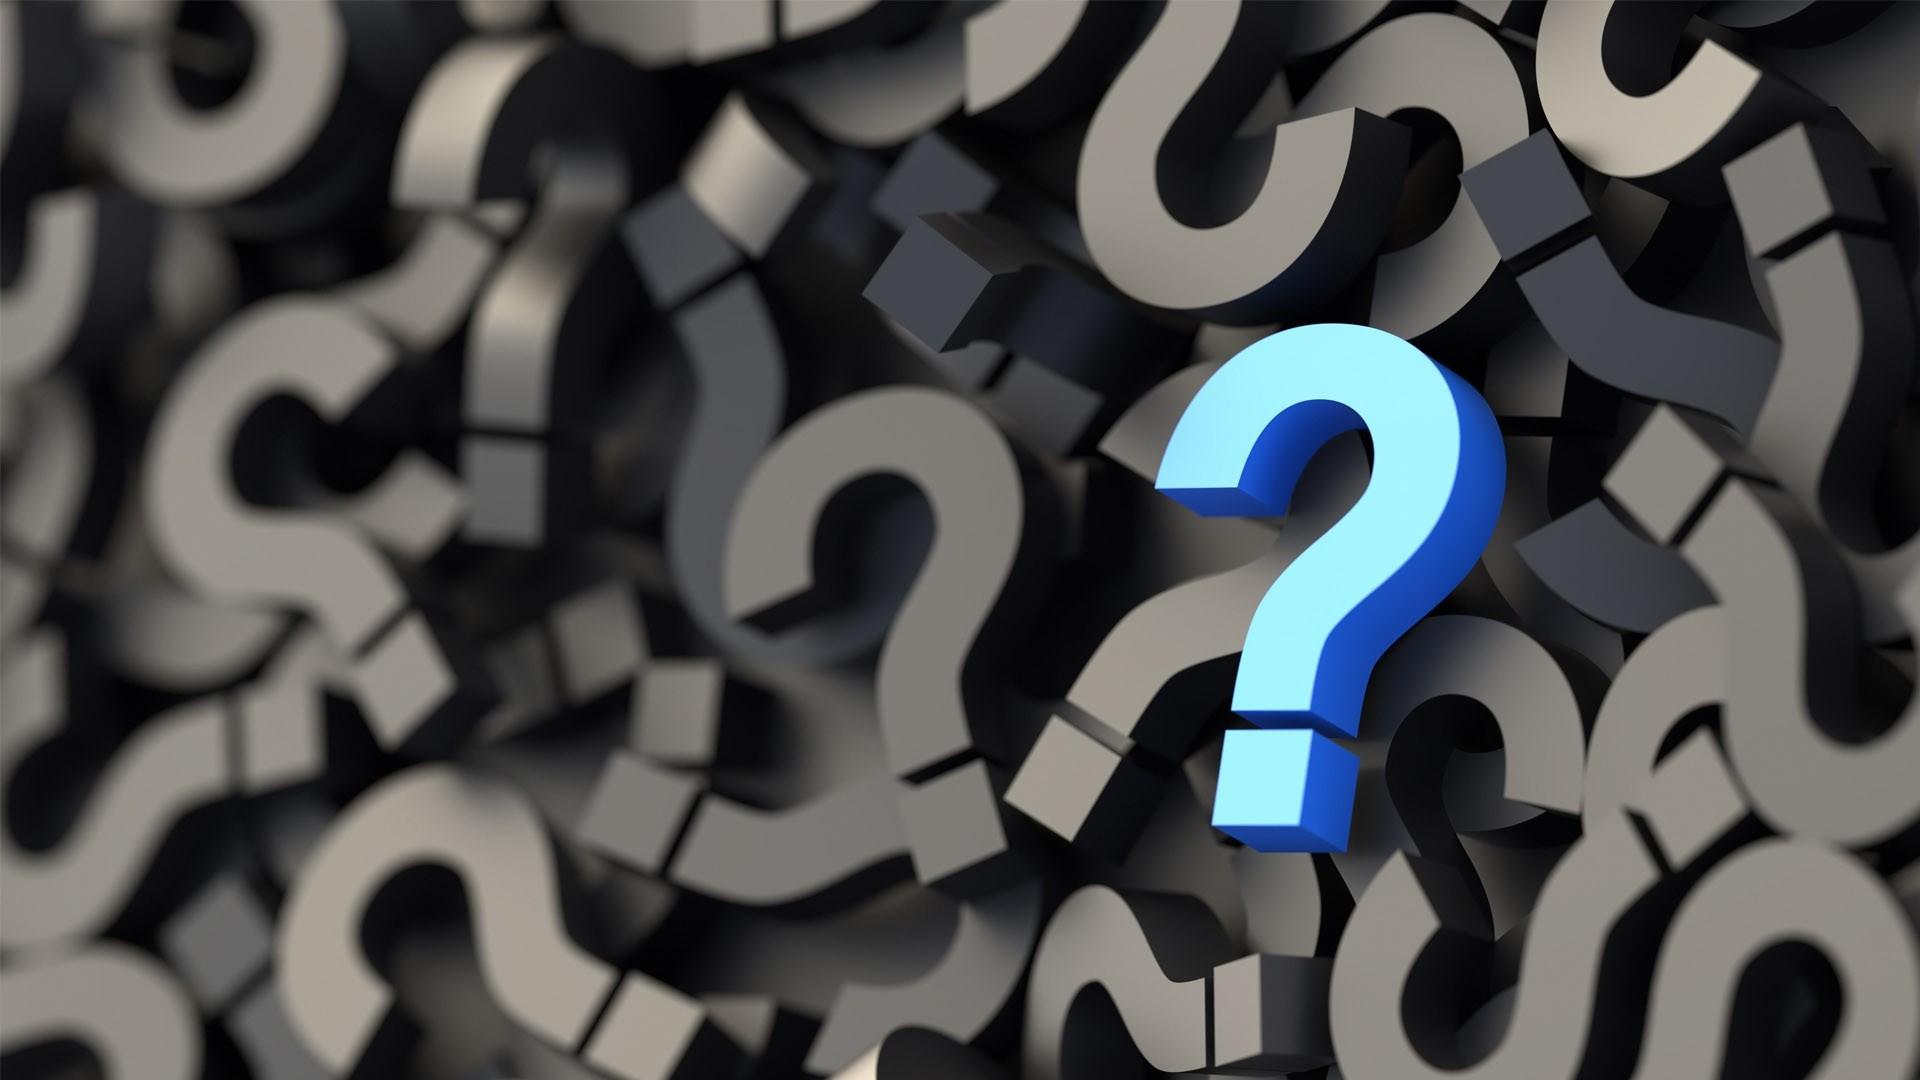 Question Mark Desktop Wallpaper